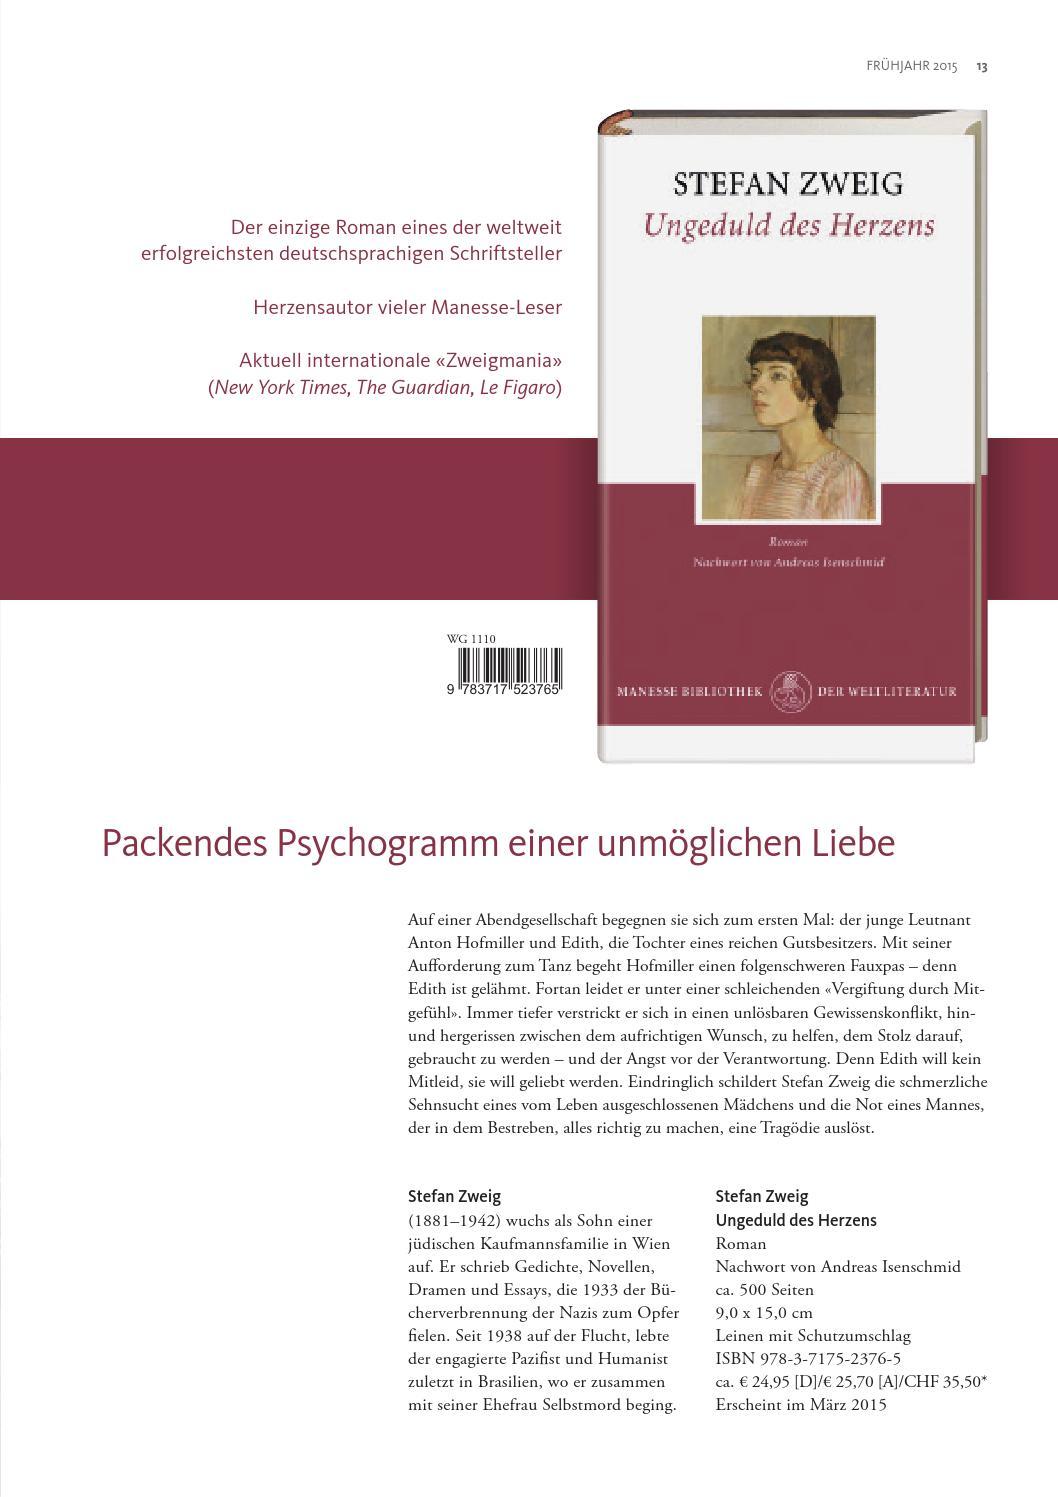 Manesse Vorschau Frühjahr 2015 By Verlagsgruppe Random House